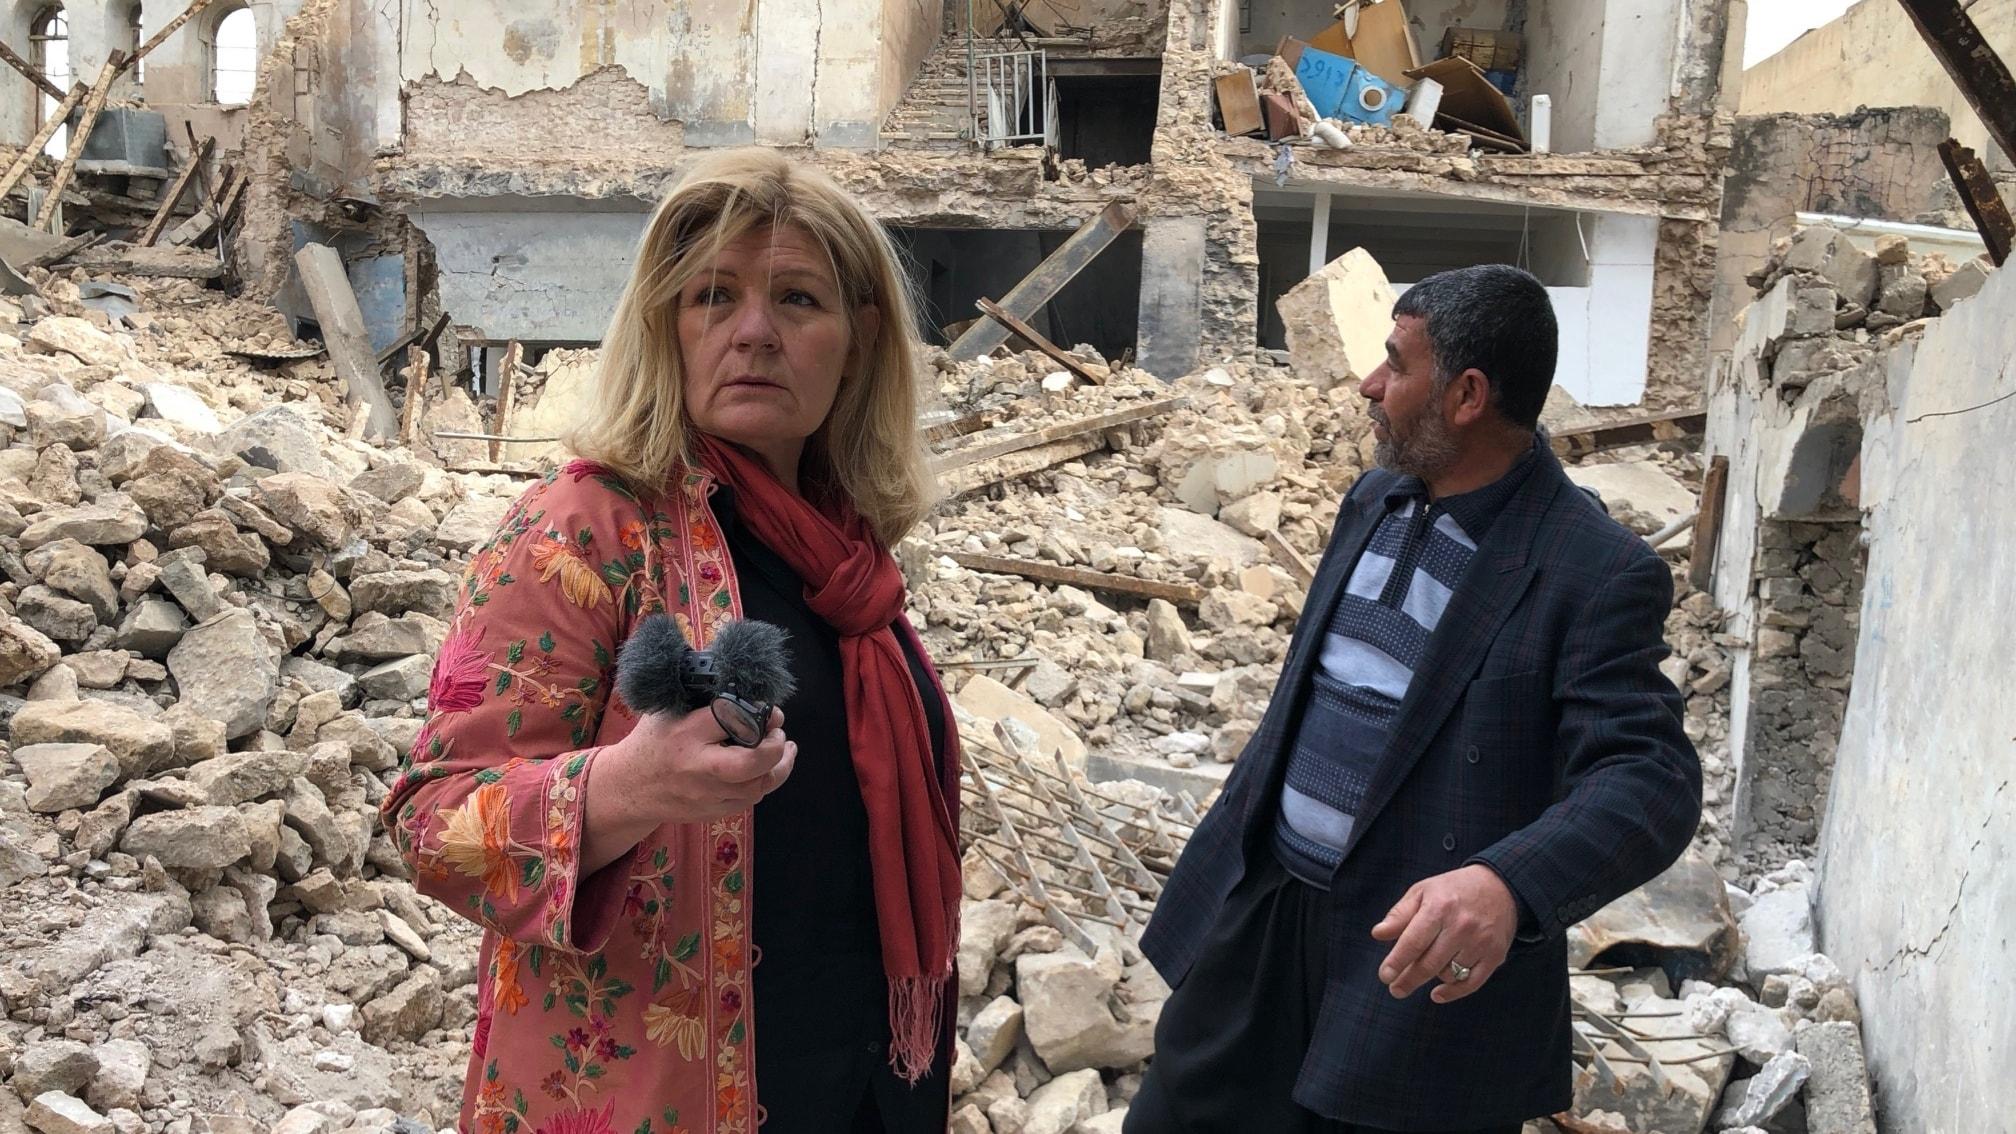 Cecilia Uddén i spillorna efter kriget mot IS i Irak